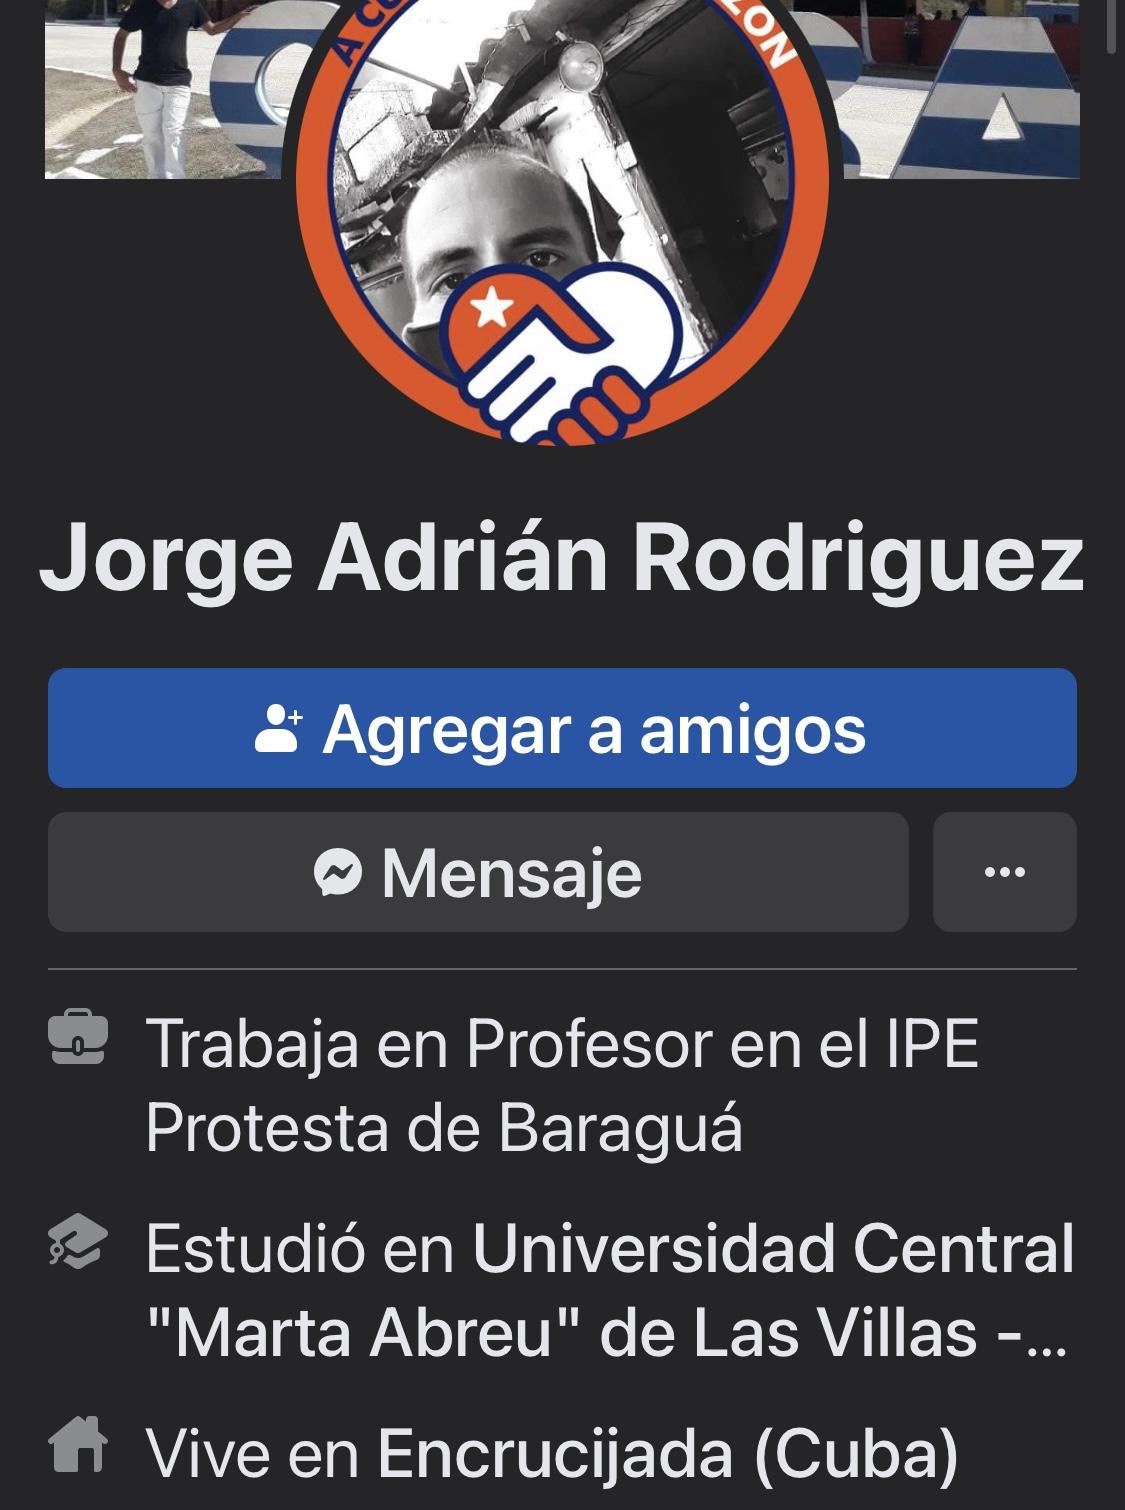 Jorge Adrian Rodriguez